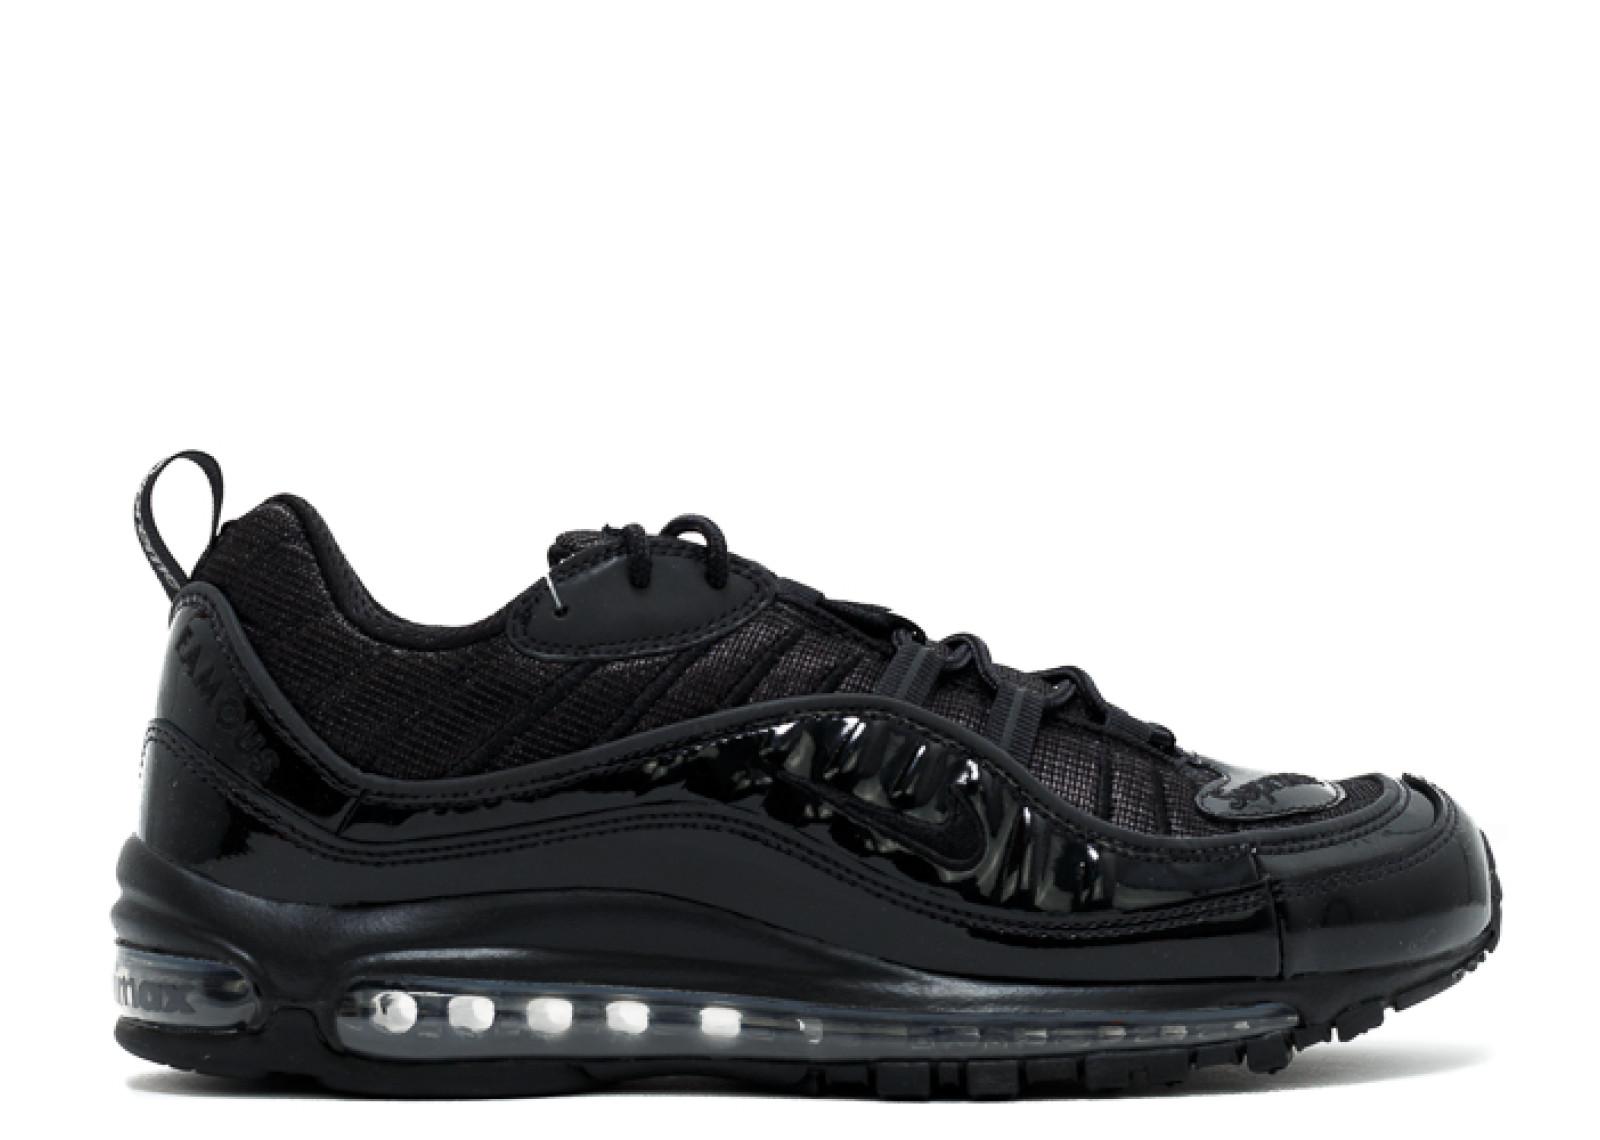 Kick Avenue - Nike Air Max 98 Supreme Black